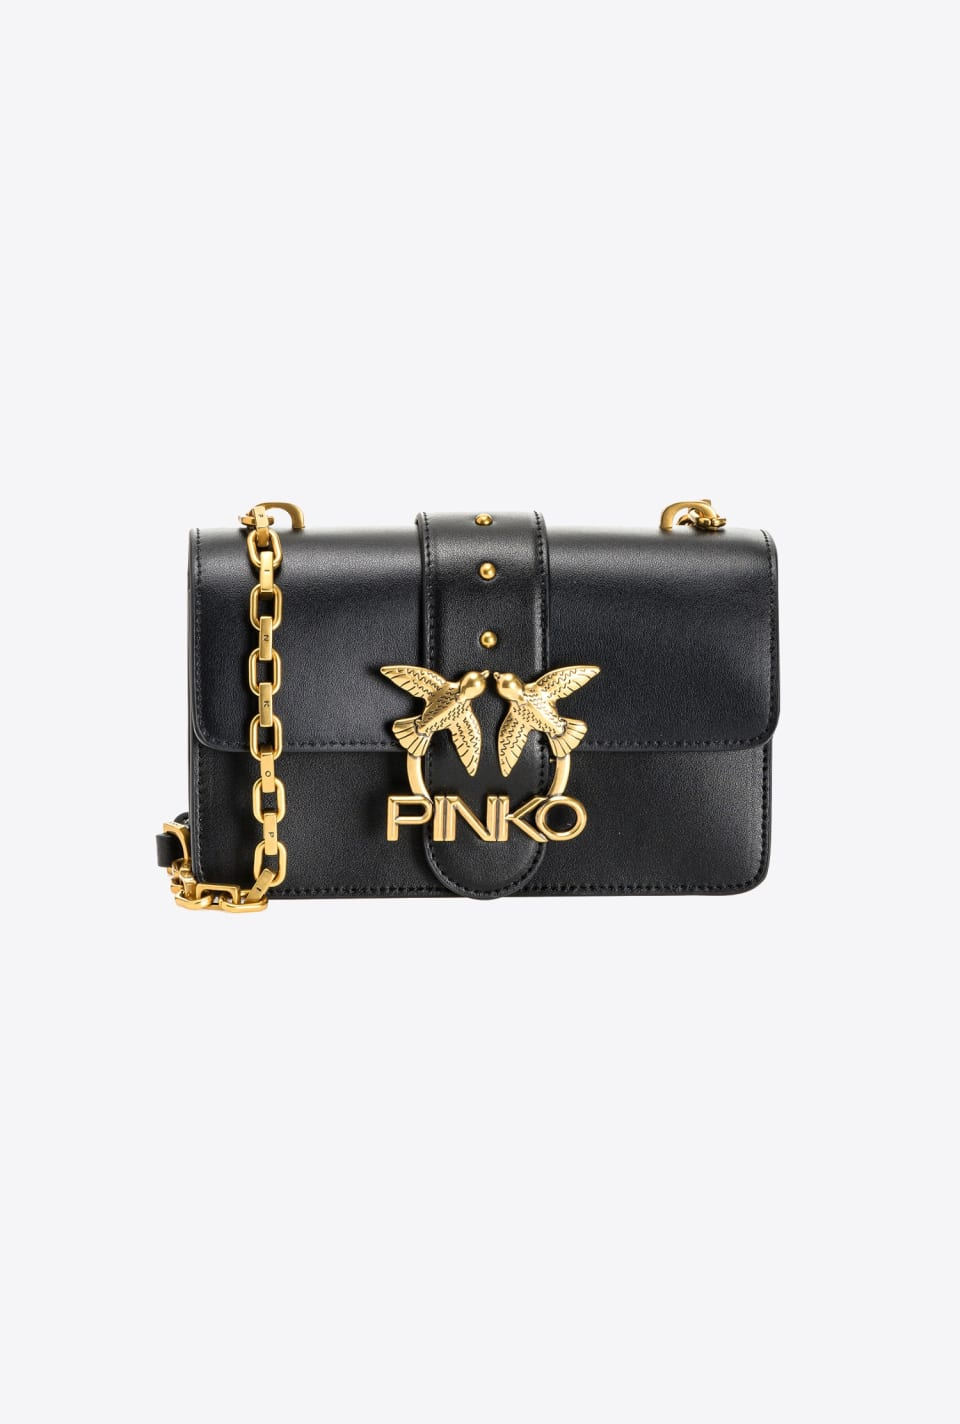 Icon Simply迷你Love手袋 - Pinko